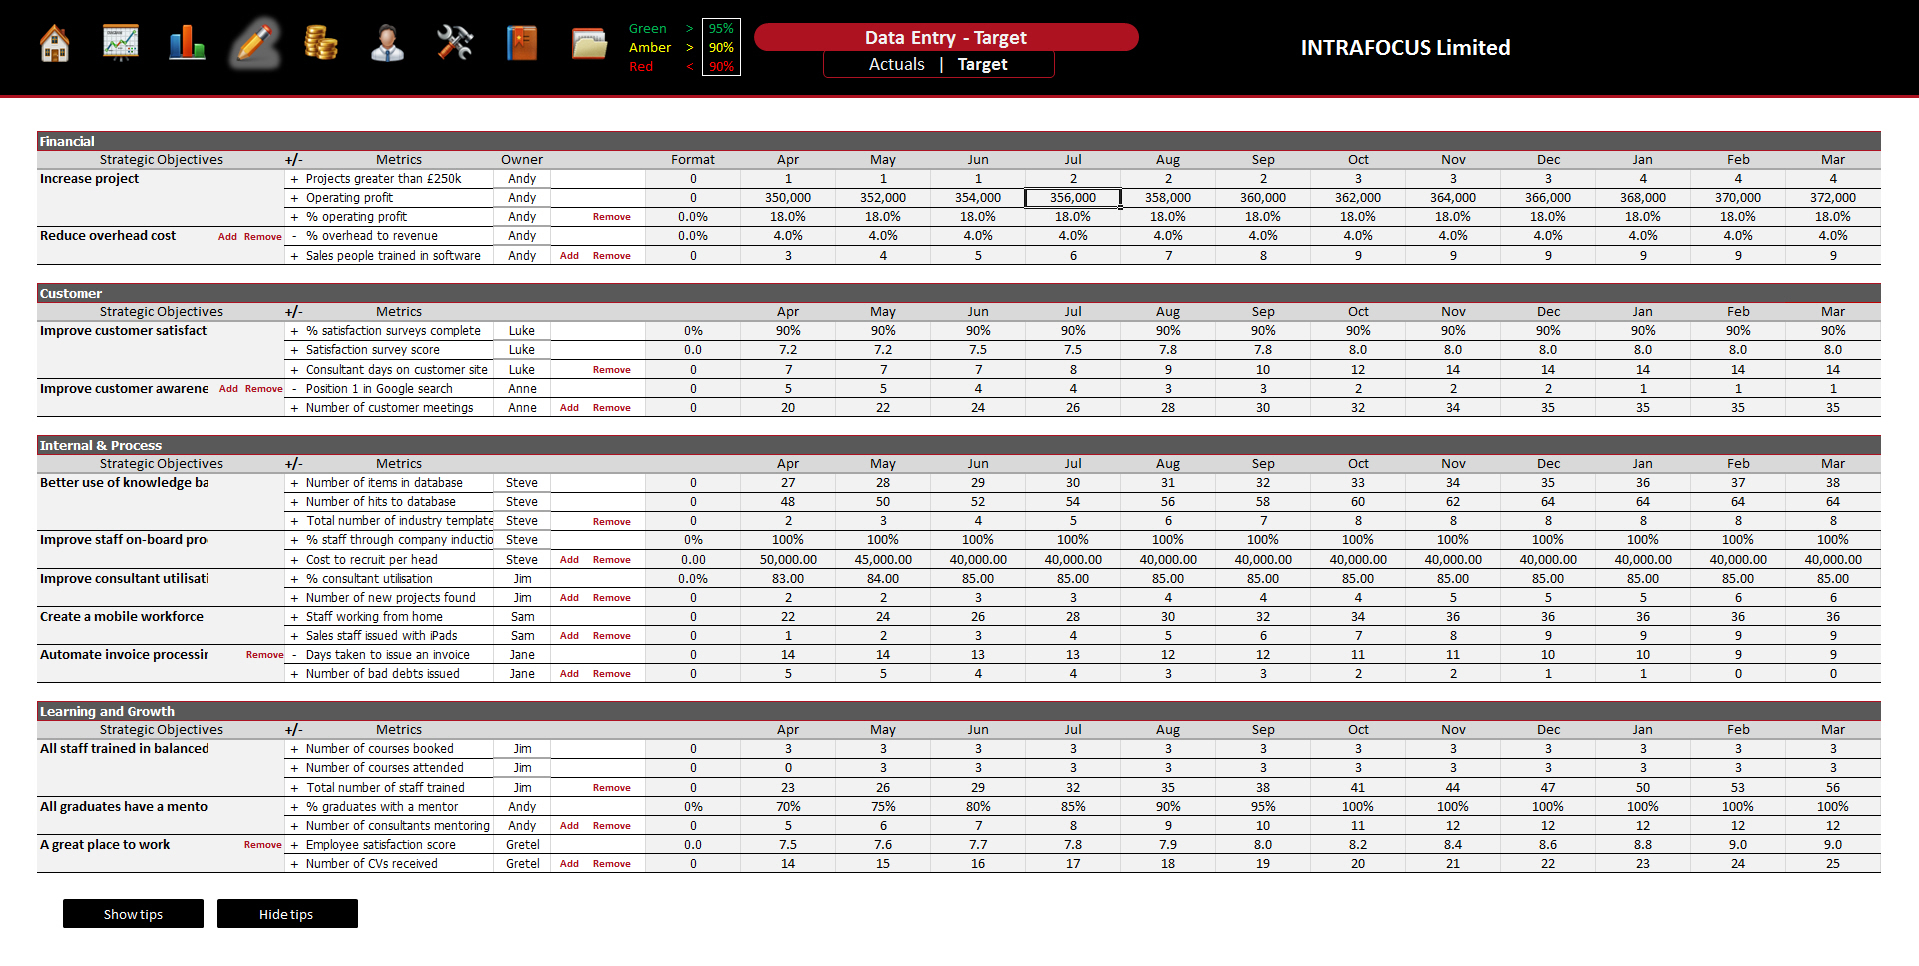 Balanced Scorecard Spreadsheet - Intrafocus Throughout Kpi Scorecard Template Excel